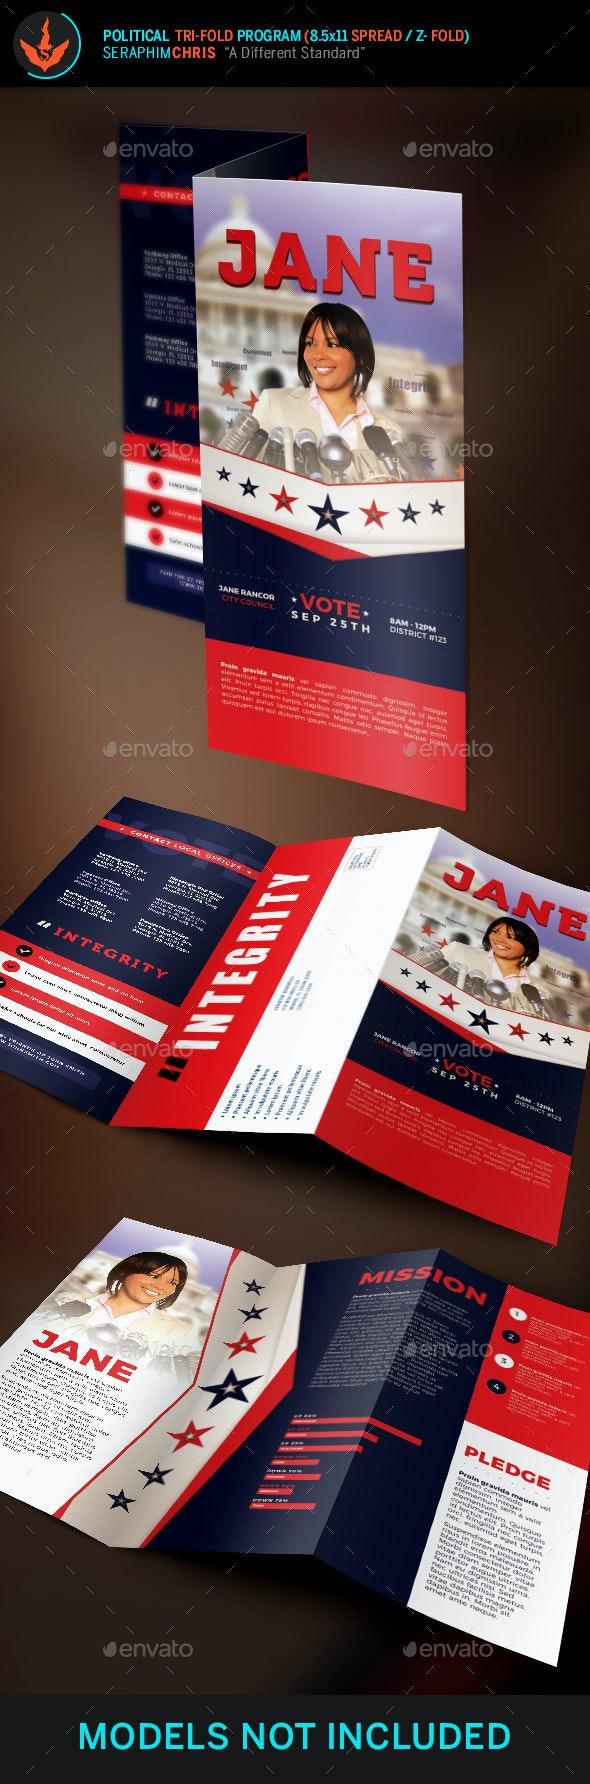 Jane 2 Political Tri-Fold Brochure Template 2 - Corporate Brochures